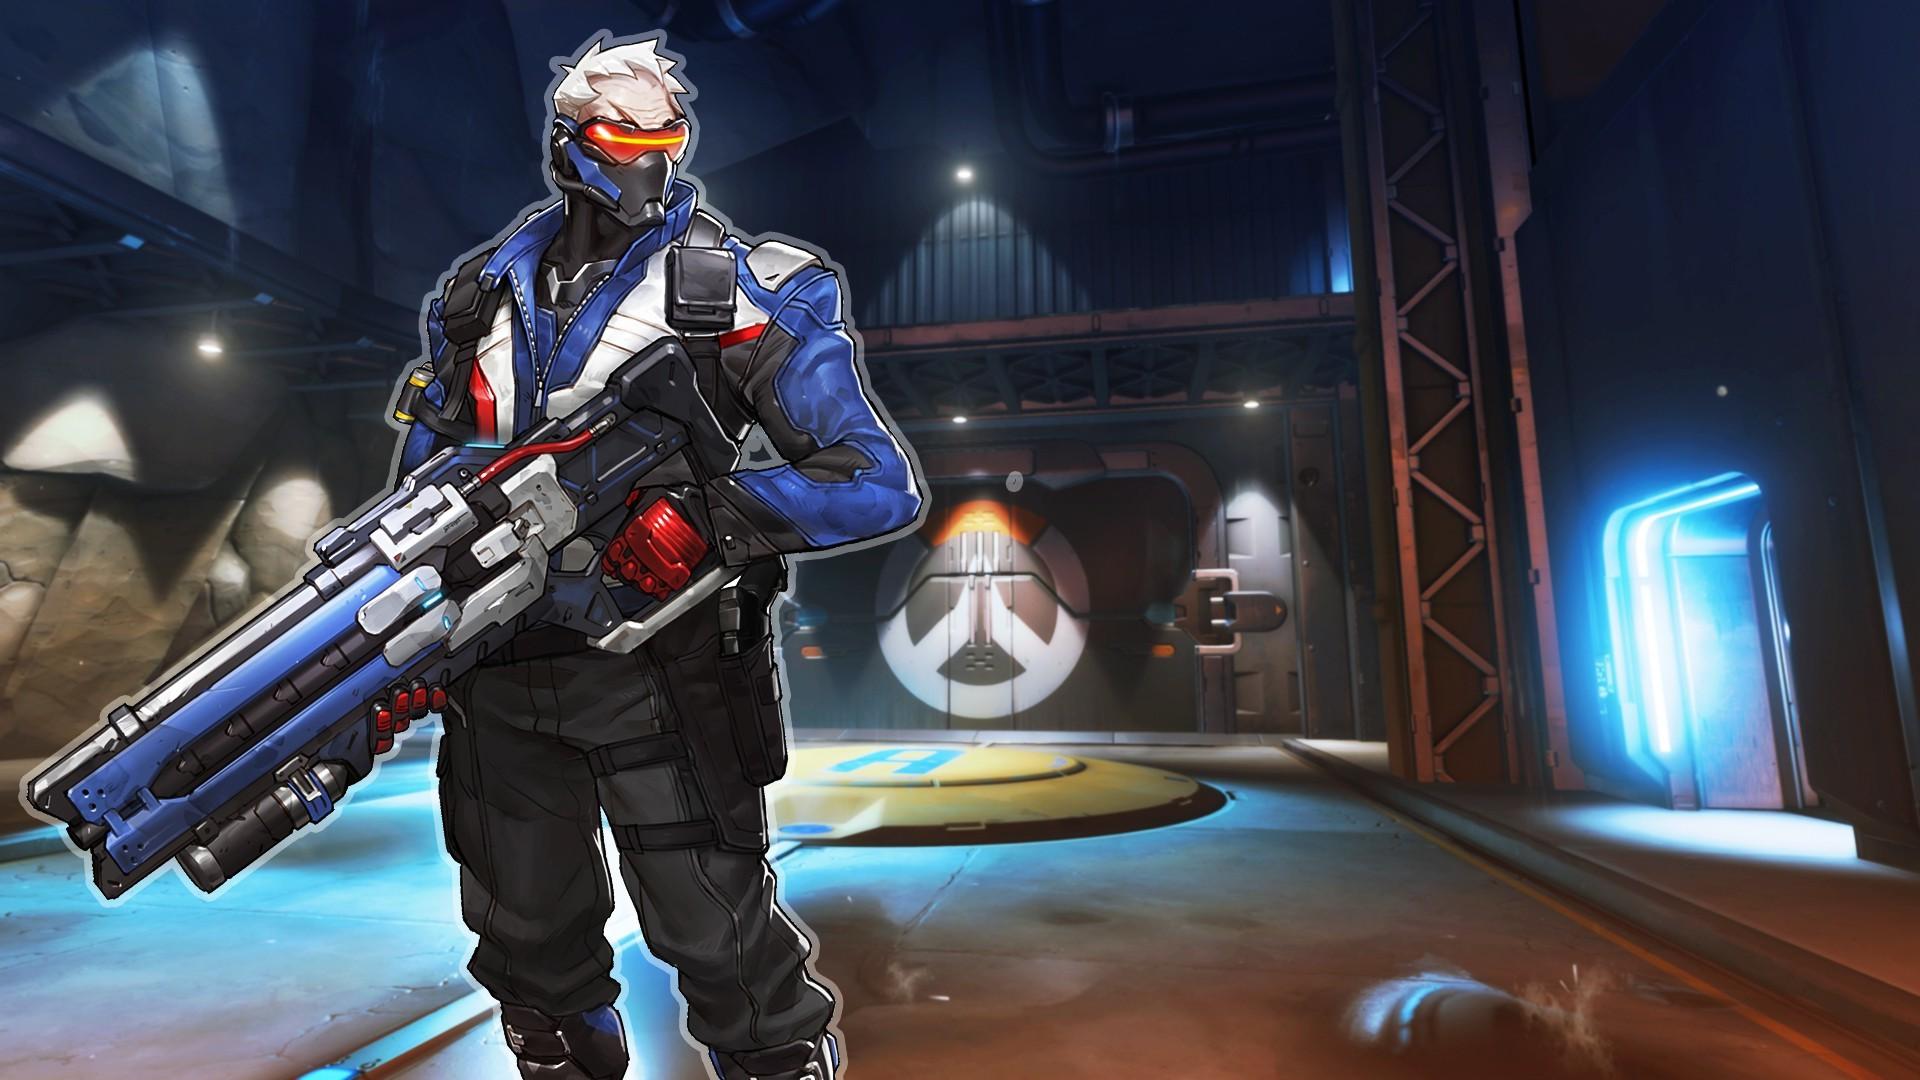 Wallpaper : video games, Overwatch, Blizzard Entertainment